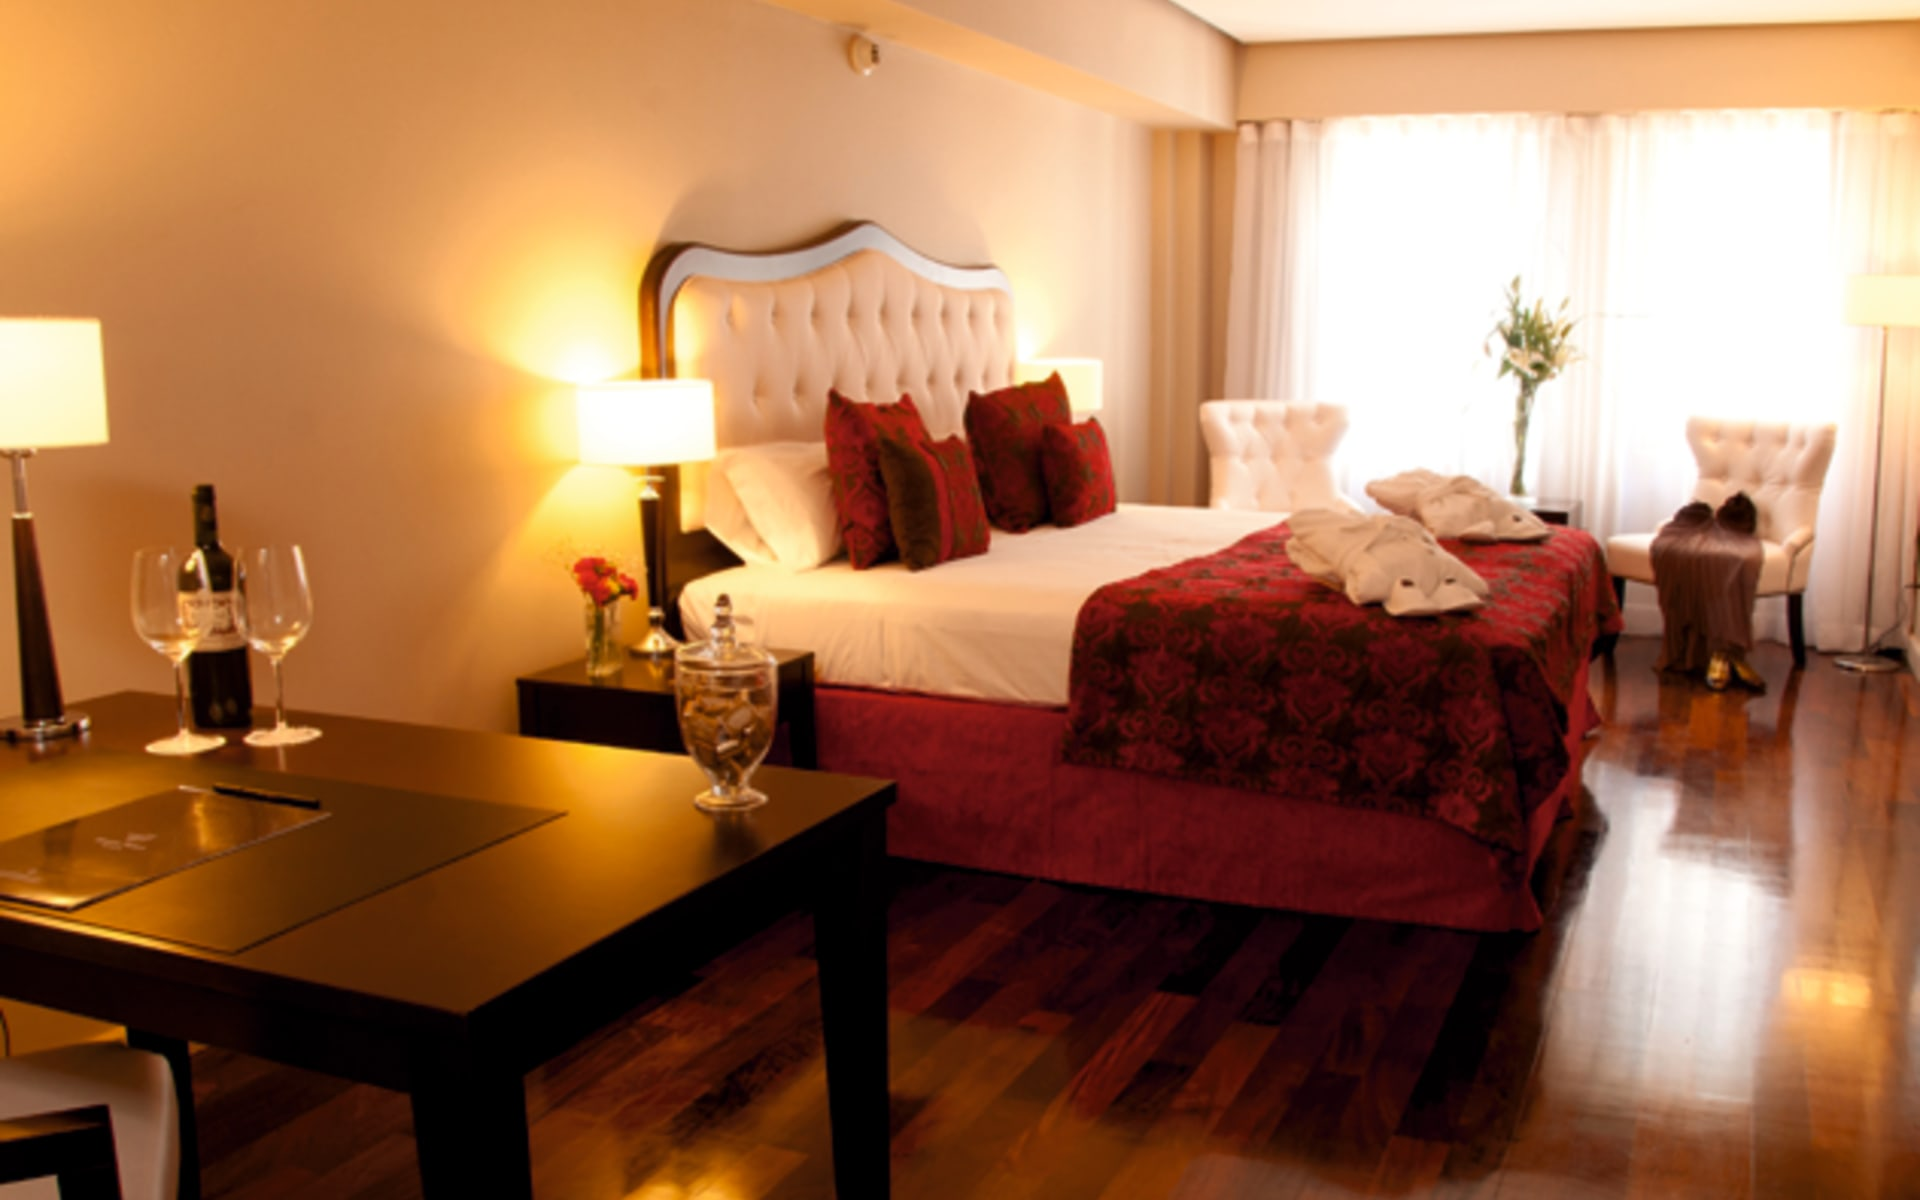 Kenton Palace in Buenos Aires: zimmer Hotel Kenton roetliches Schlafzimmer